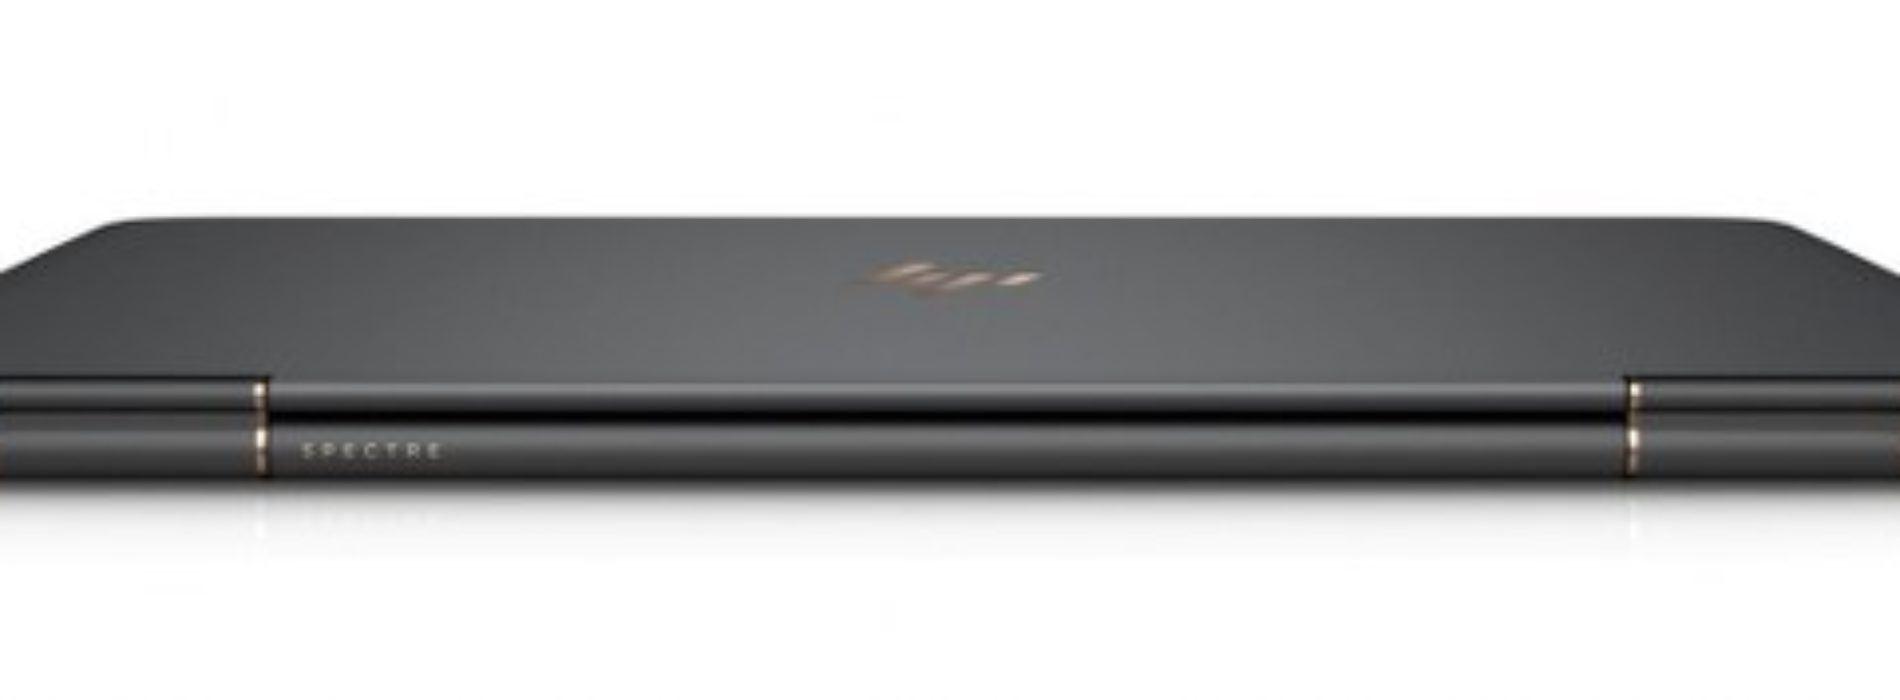 HP Spectre x360 15